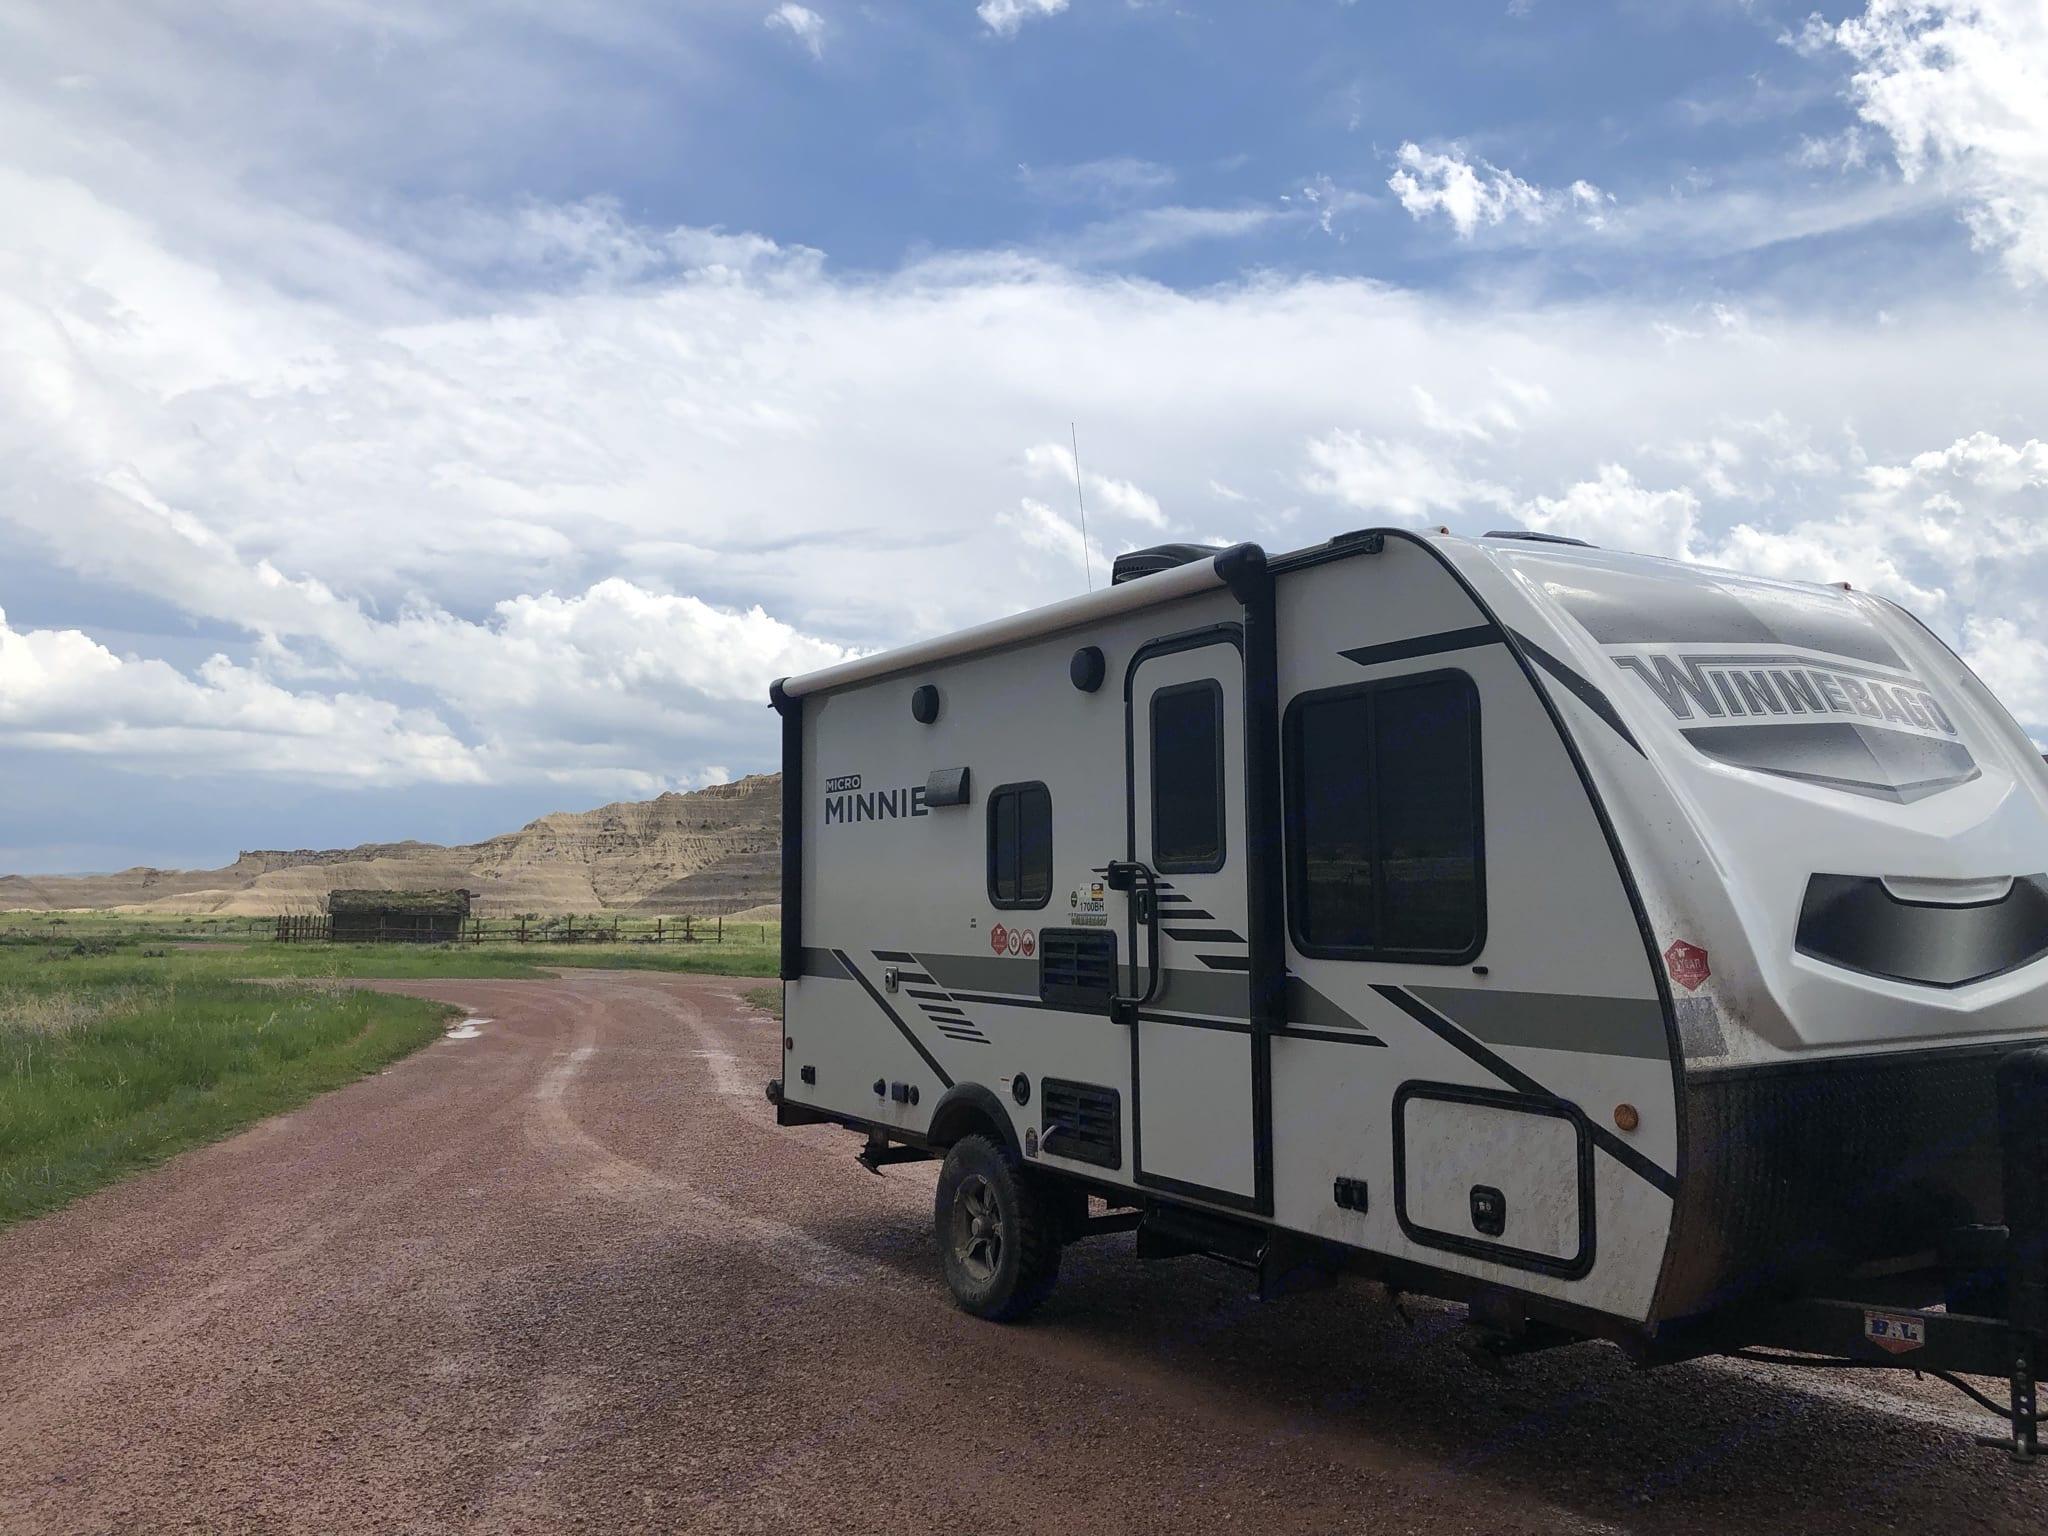 Toadstool Park in Nebraska. On the road!. Winnebago Micro Minnie 2021